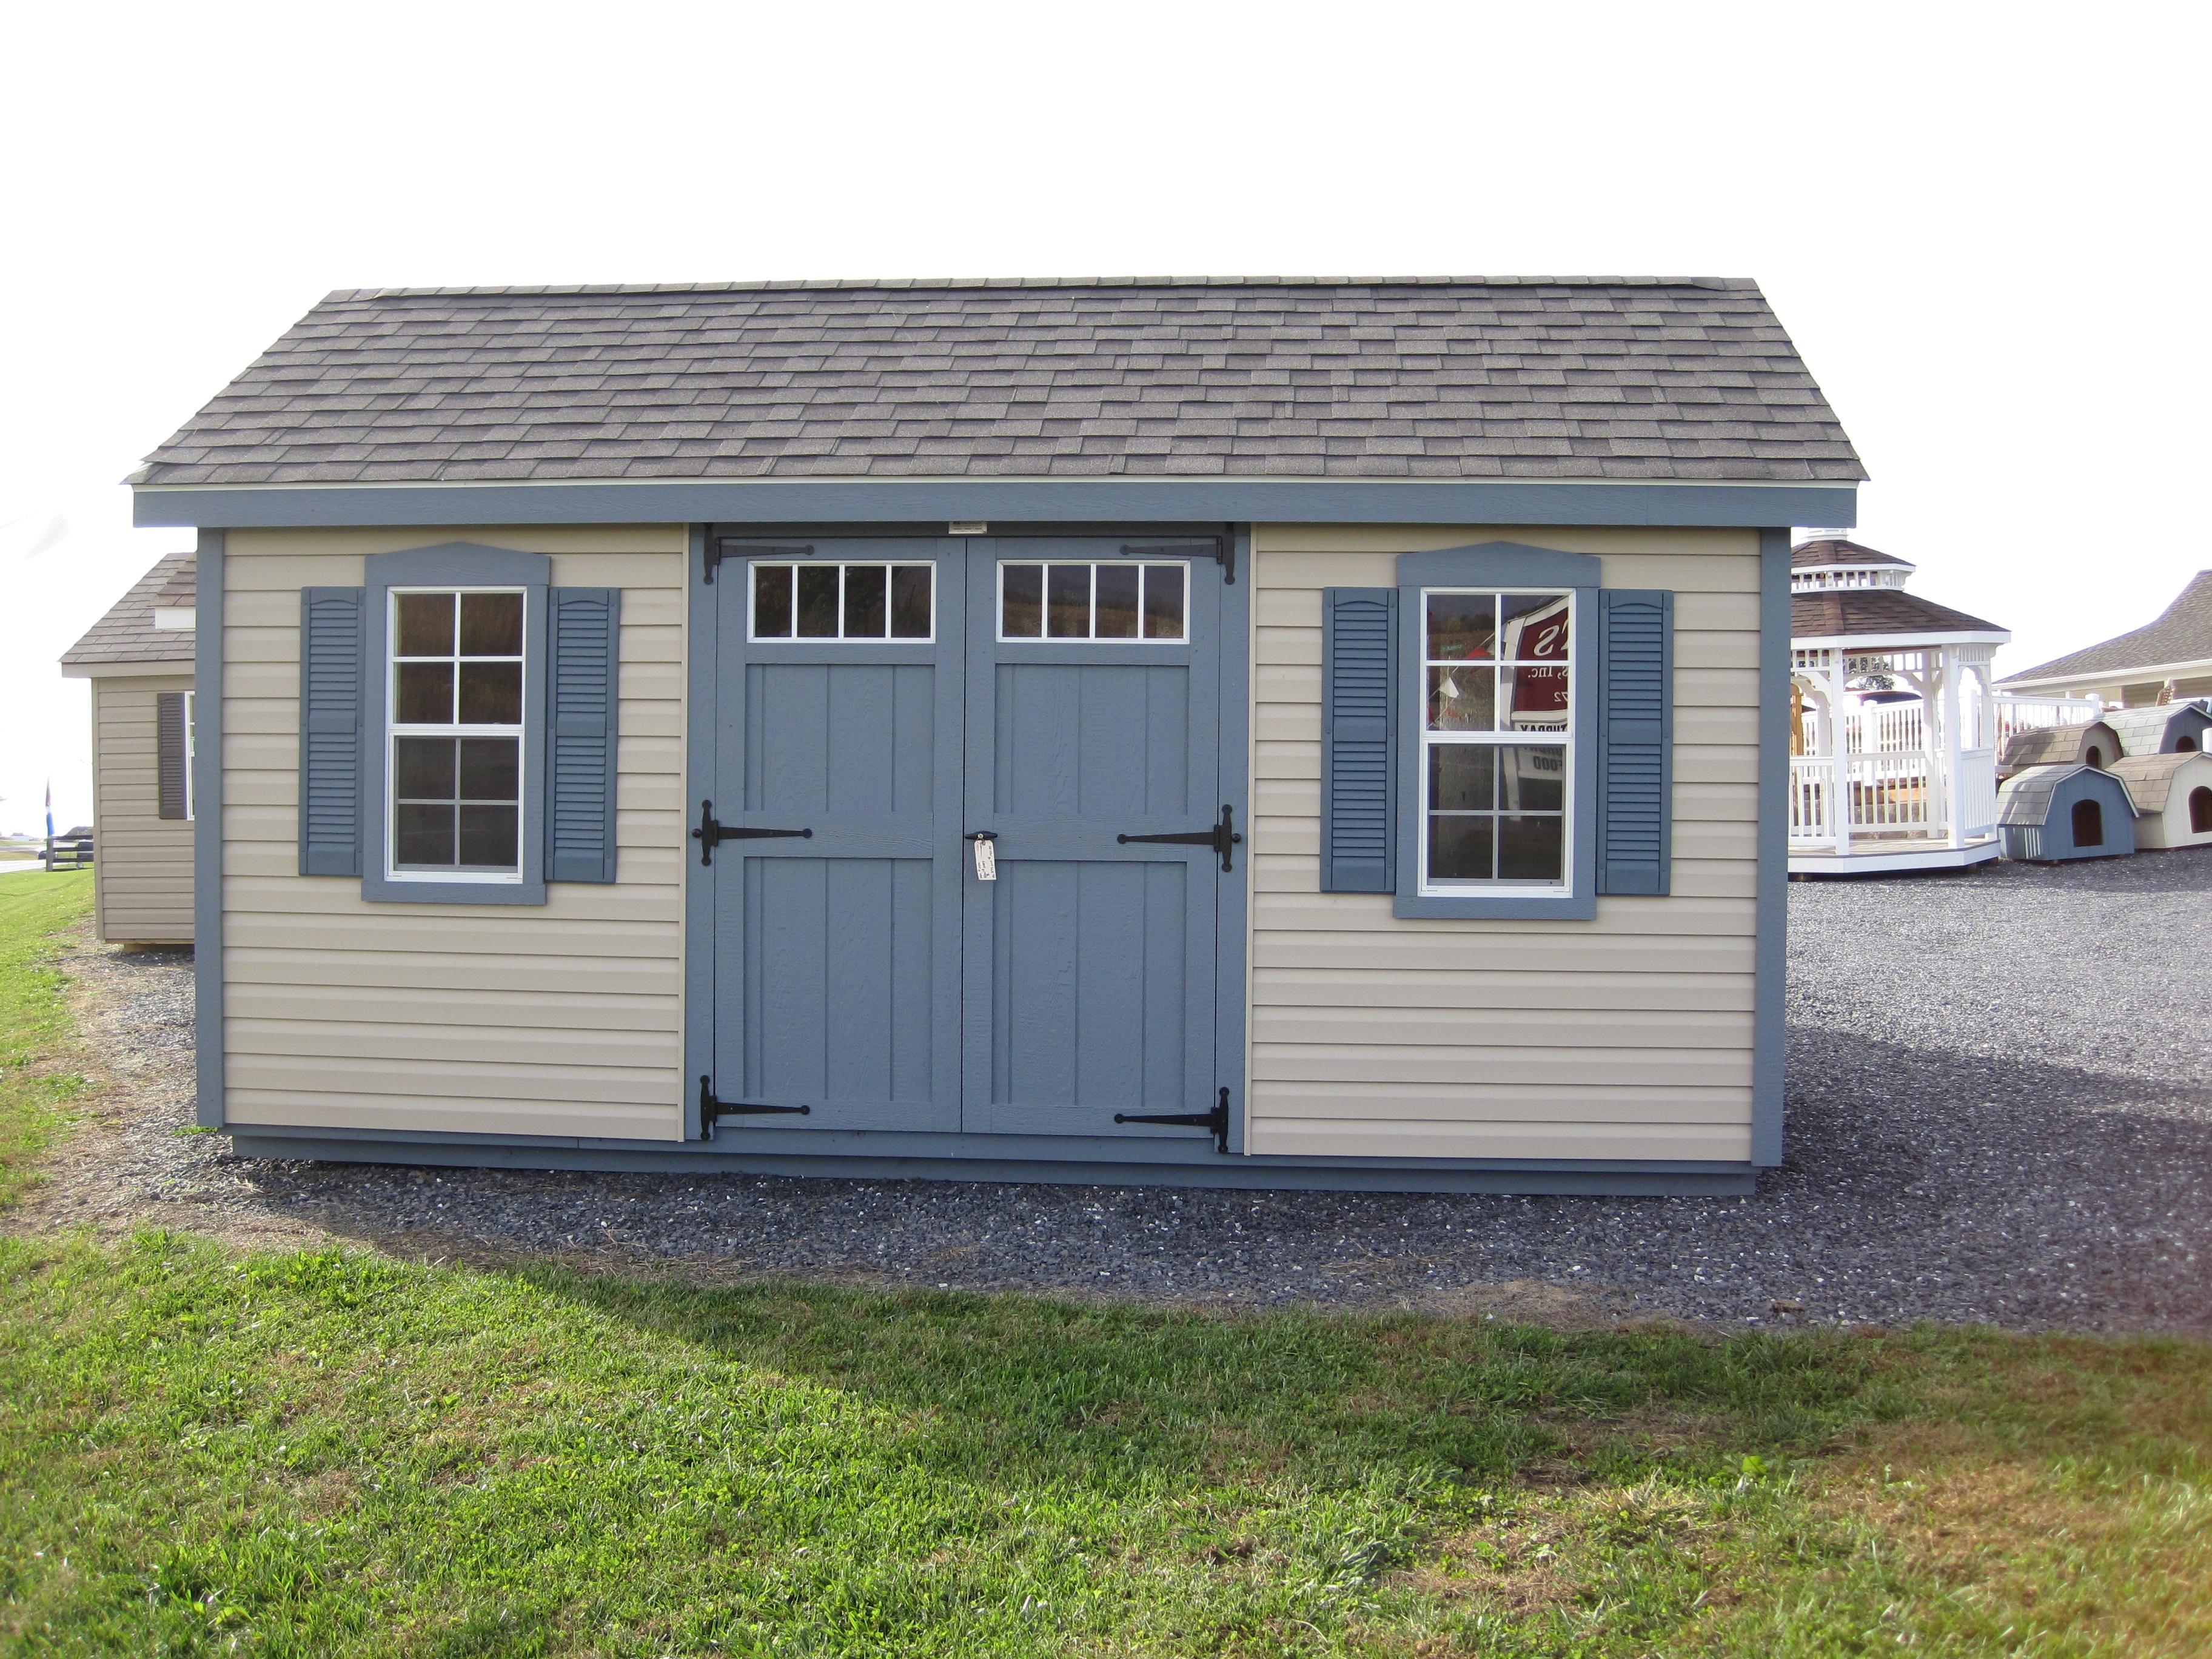 Byler Barns Backyards 2259 W Main St Salem Va 24153 Yp Com